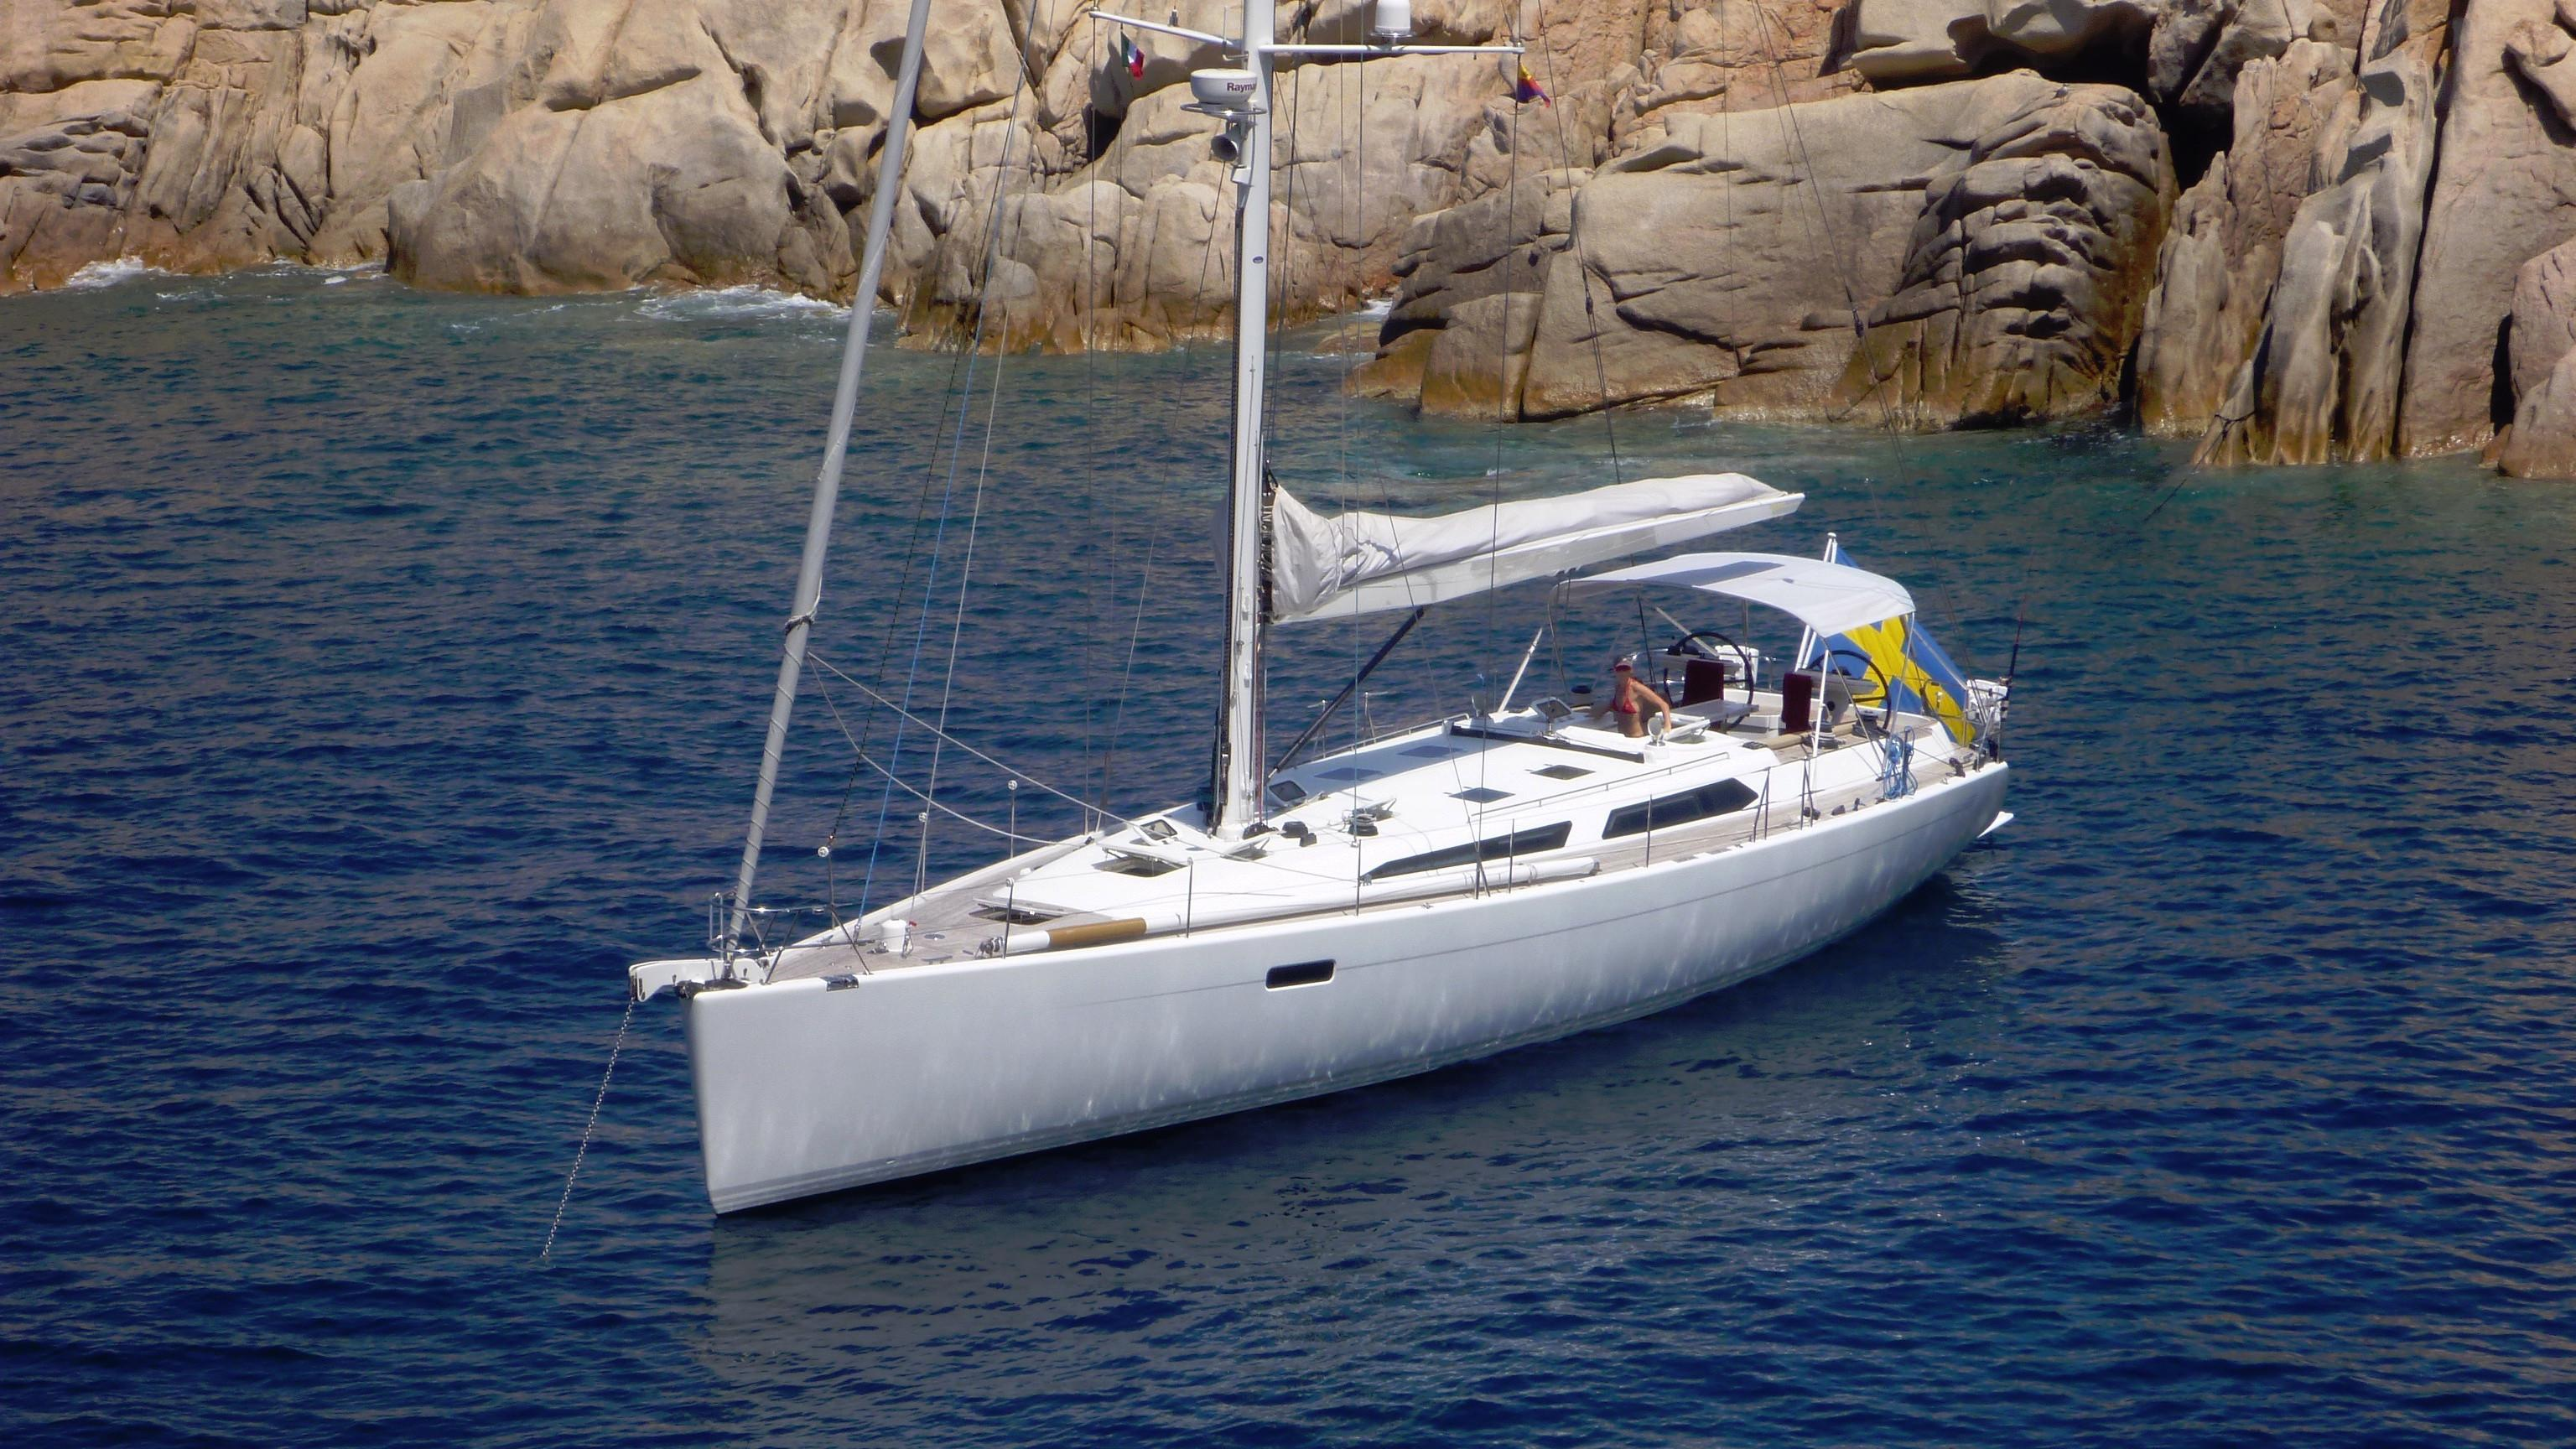 Baltic 56 lifting keel